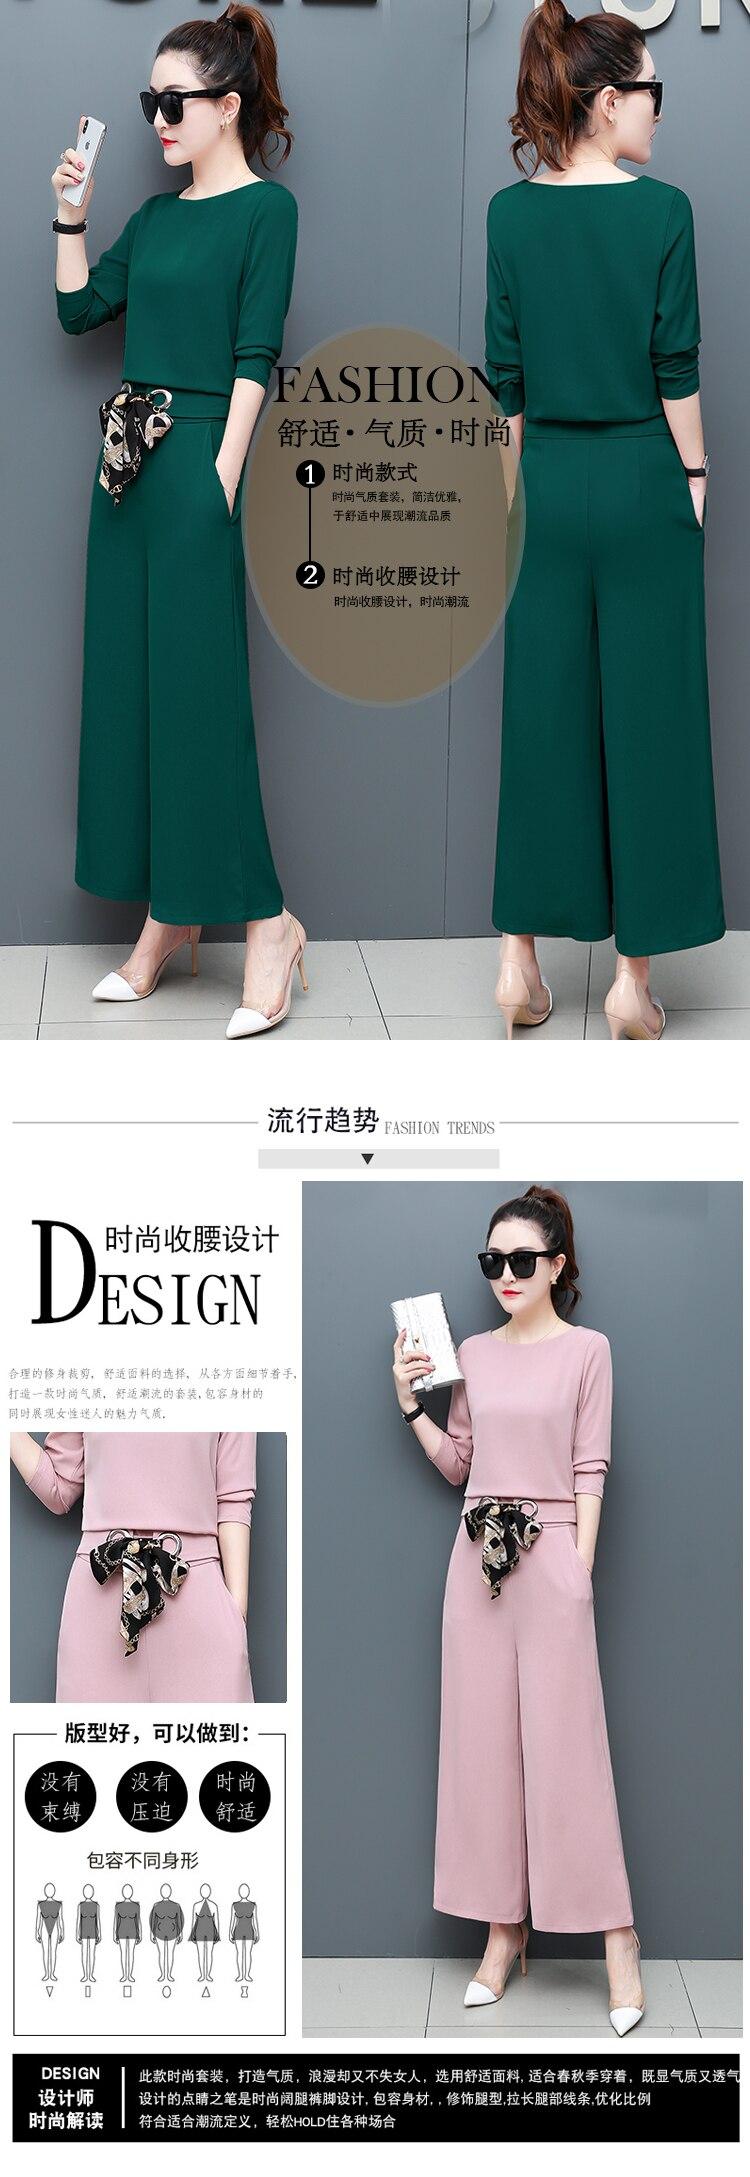 Chiffon 2 Piece Set Women Long Sleeve Tops And Wide Leg Pants Trousers Set Suits Spring Autumn Casual Office Elegant Women's Set 10